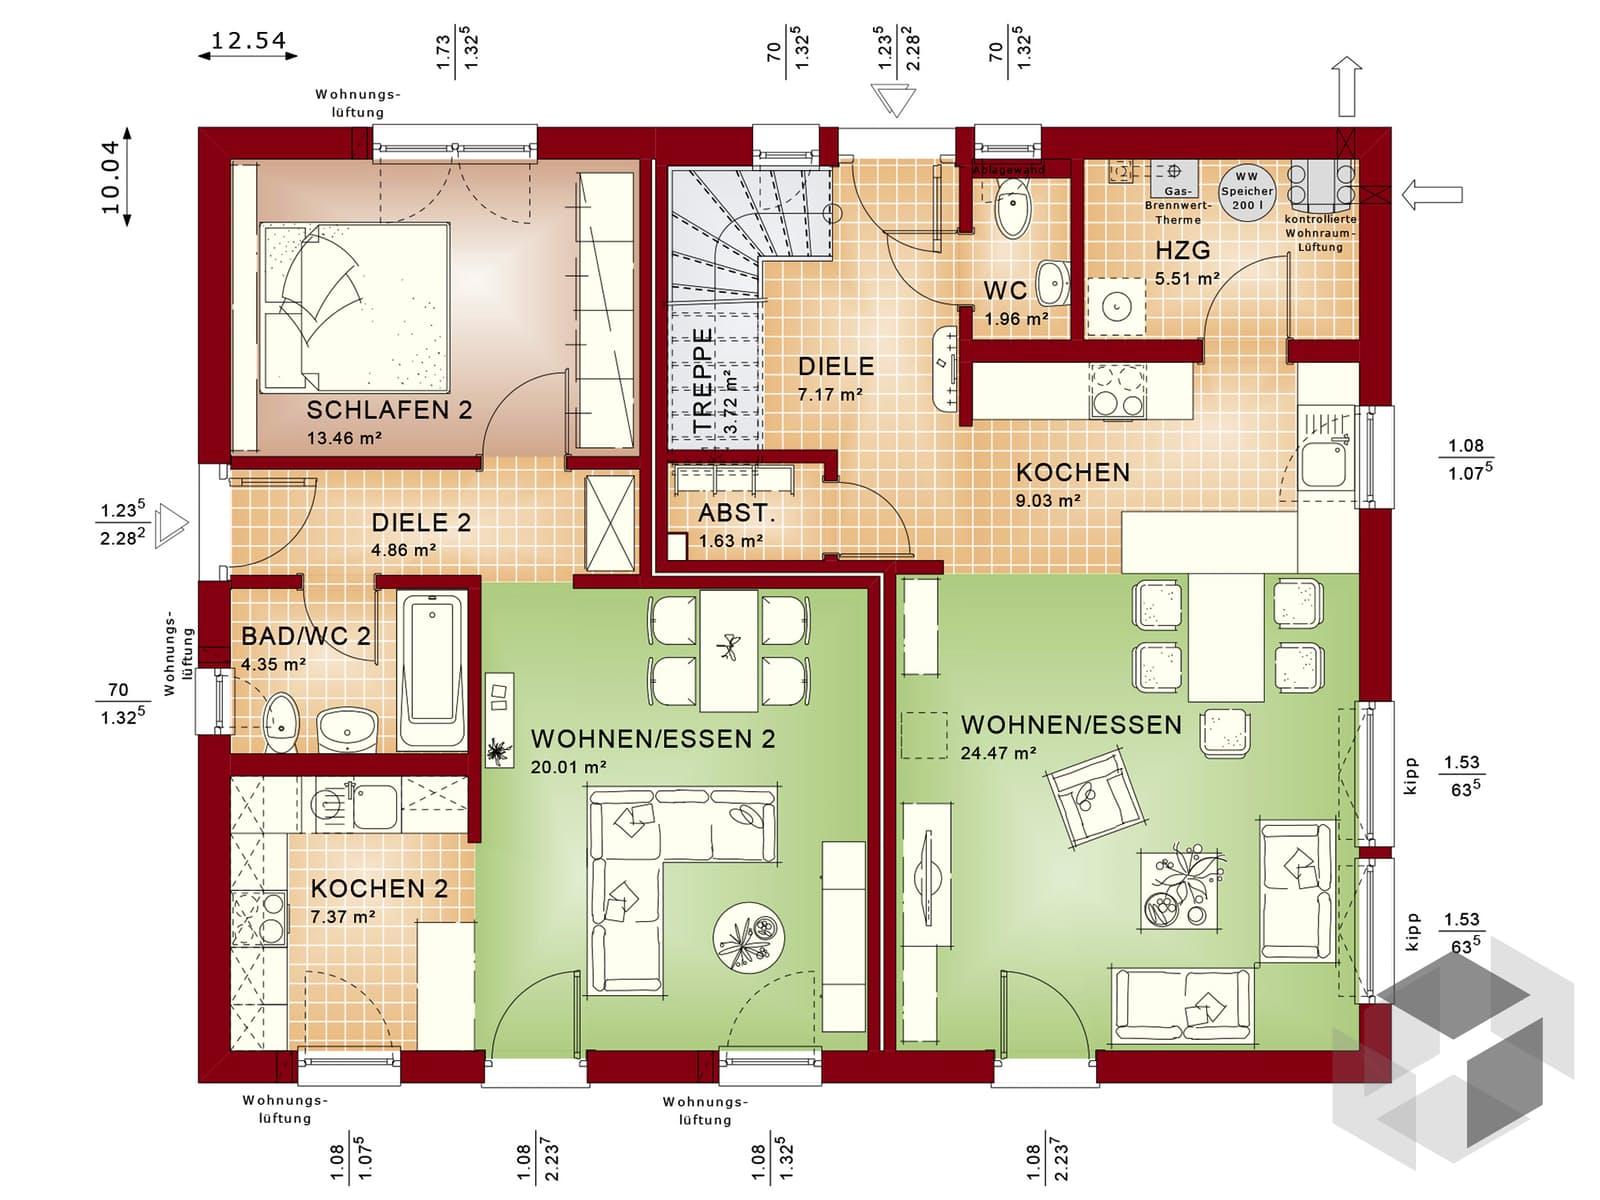 evolution 207 v6 von bien zenker komplette daten bersicht. Black Bedroom Furniture Sets. Home Design Ideas